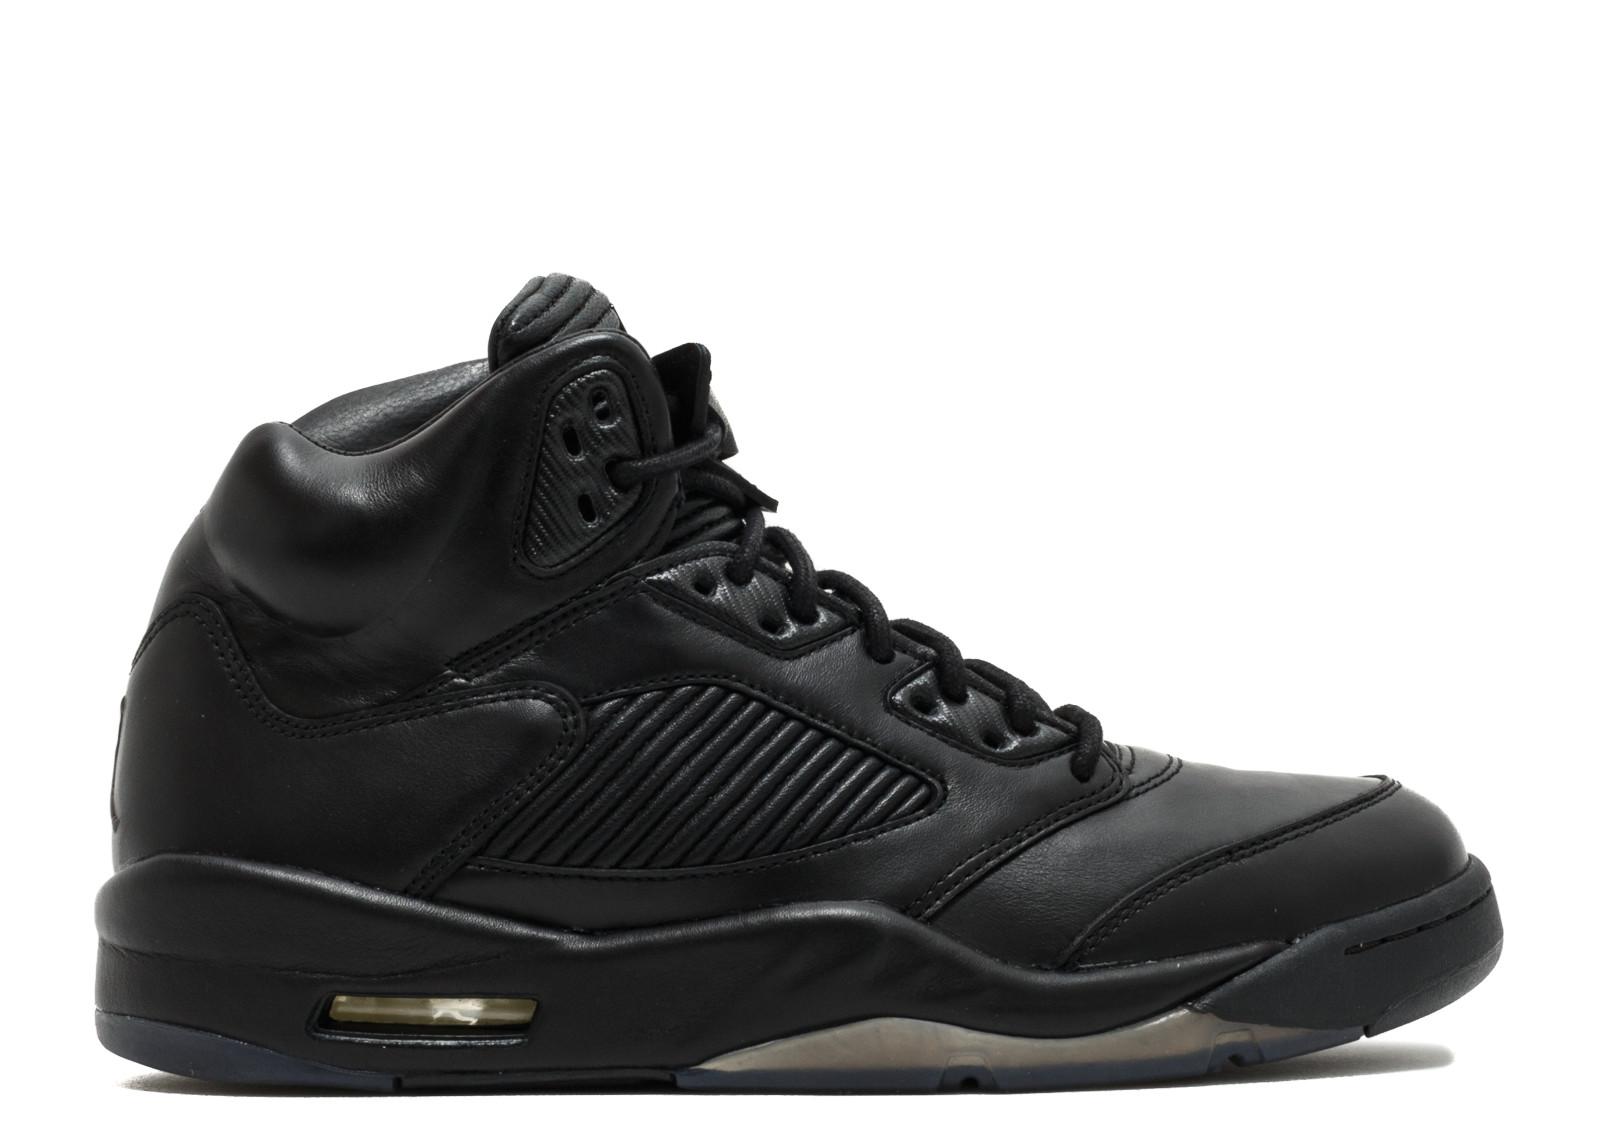 separation shoes 10277 538eb Jordan 5 Retro Triple Black